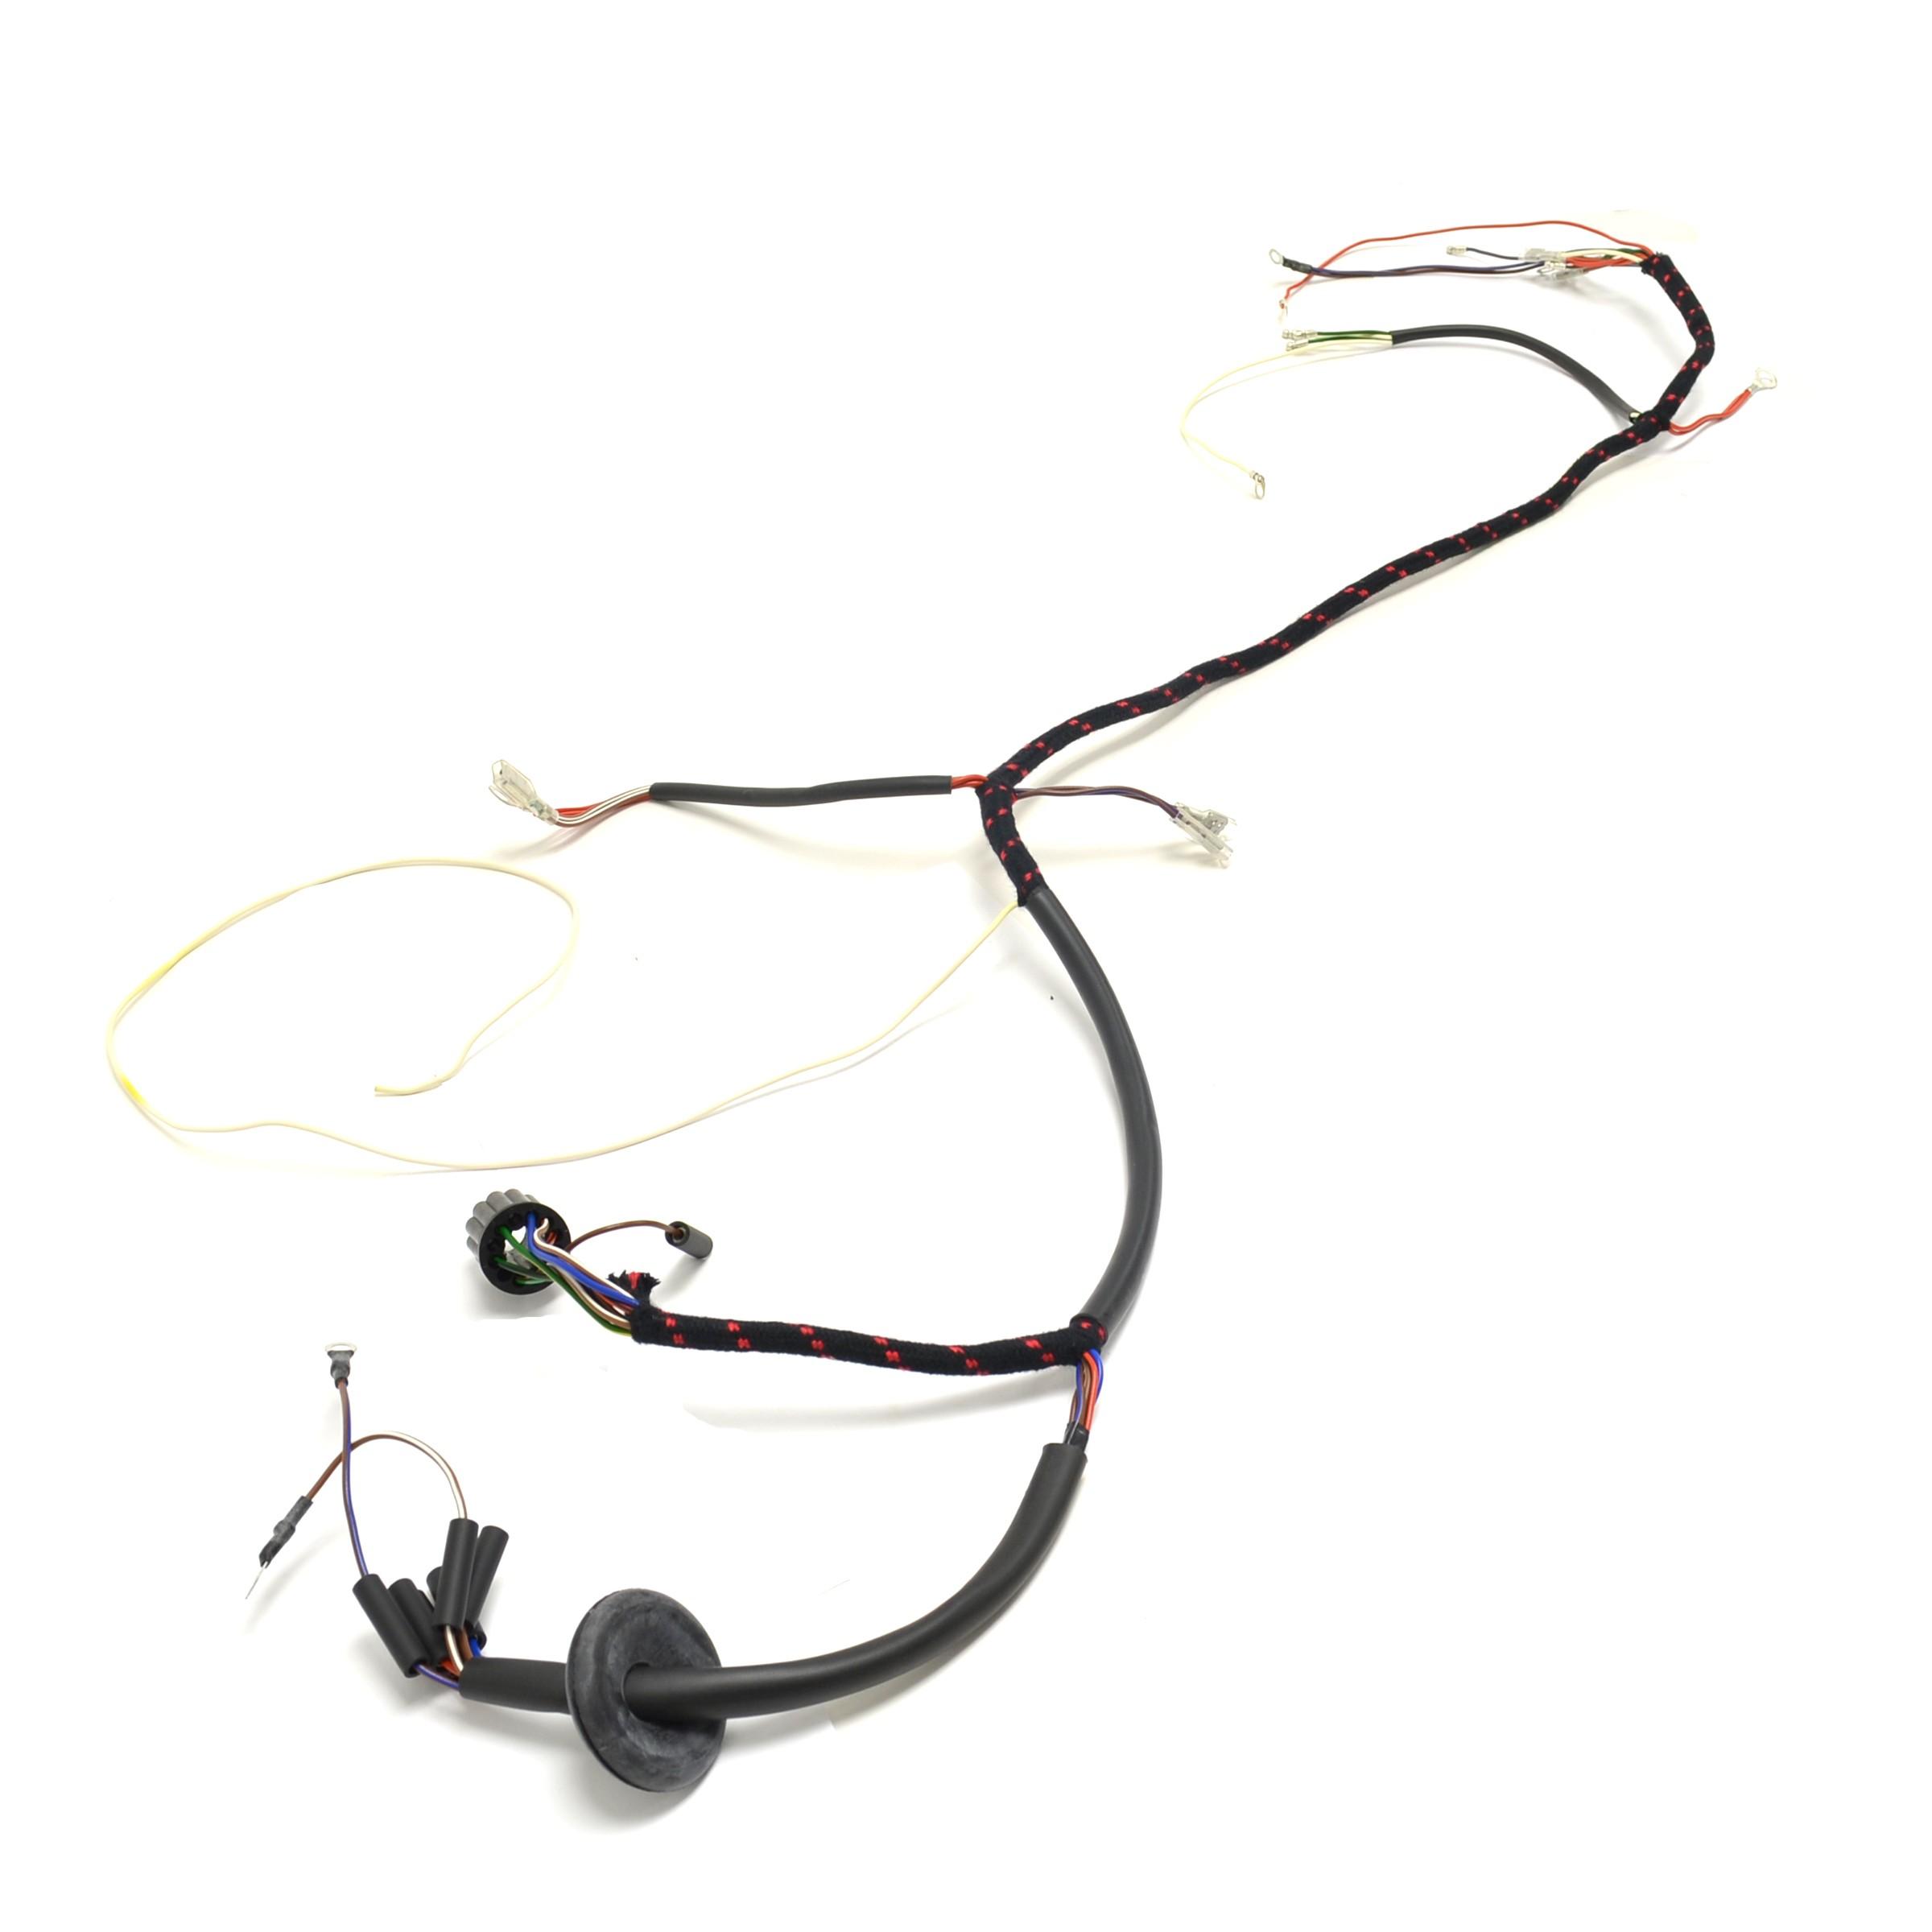 farmall cub 12 volt wiring diagram mgf horn imageresizertool com